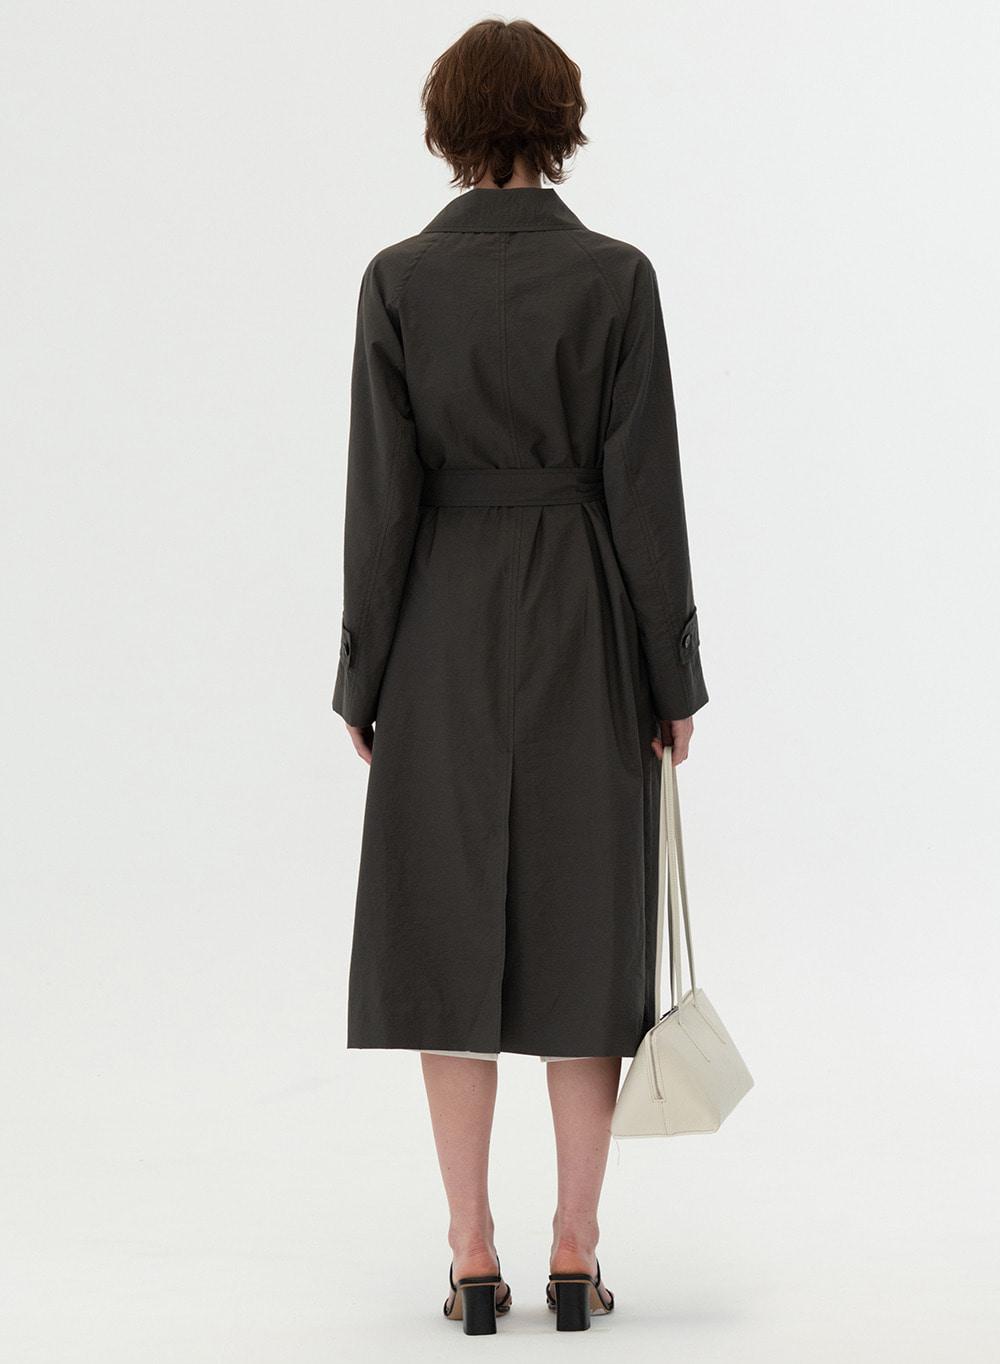 [ESSENTIAL] Lightweight Single Coat Deep-Khaki